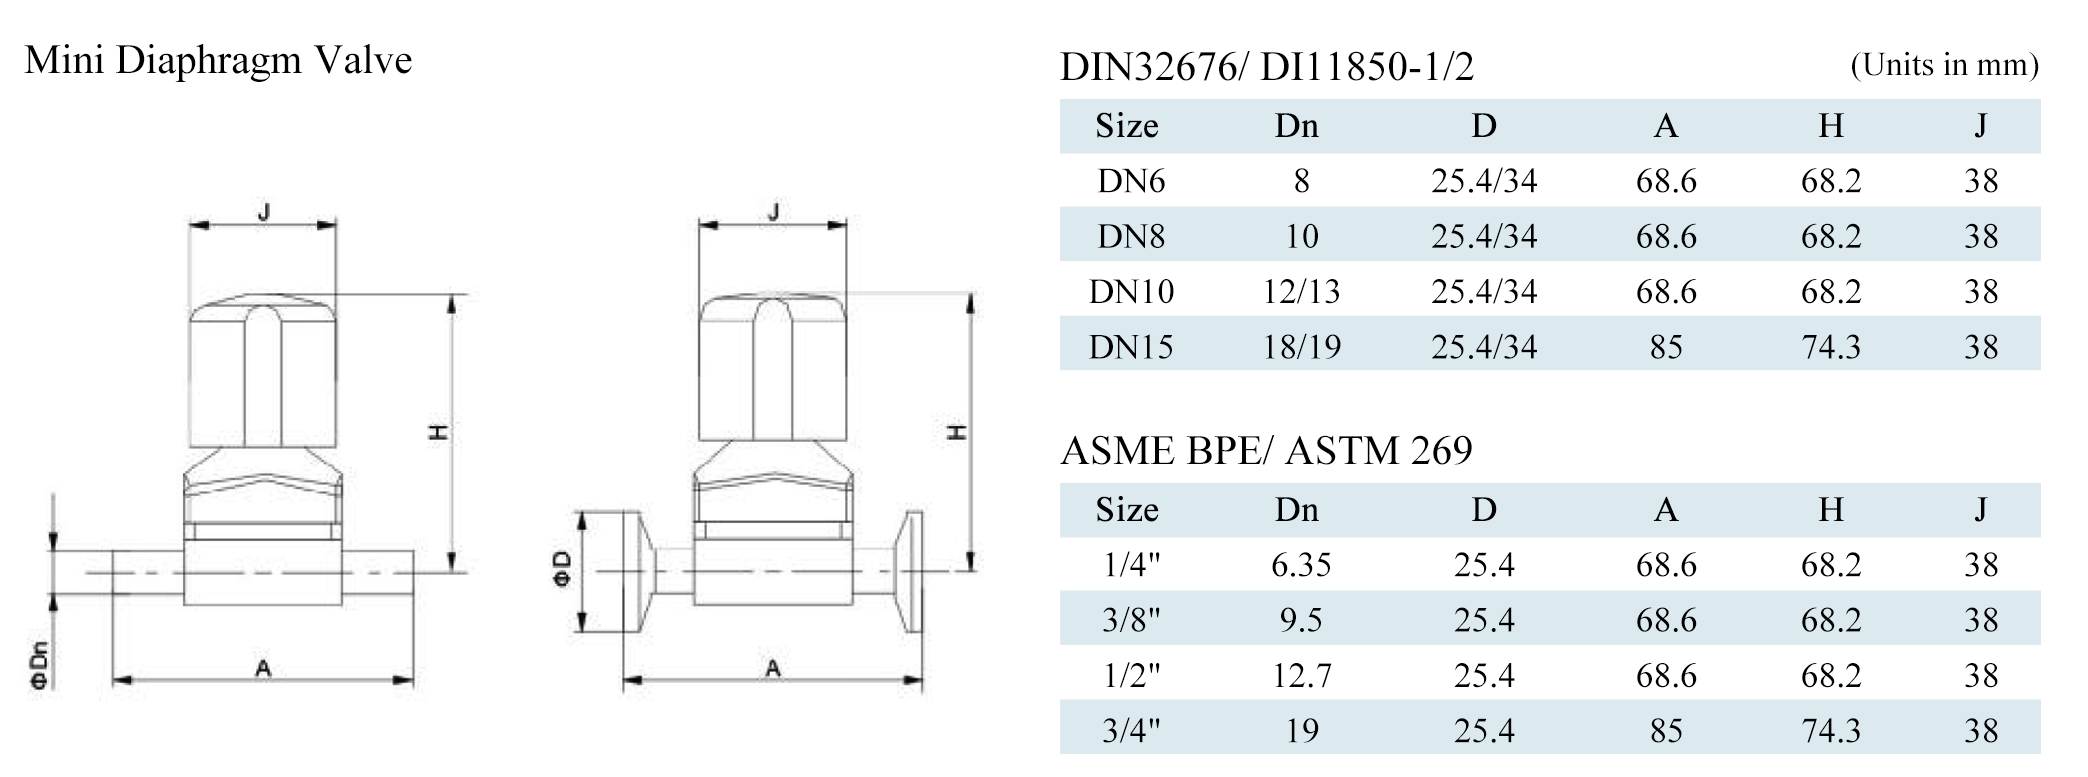 Manual tri clamp sanitary mini diaphragm valves adamant